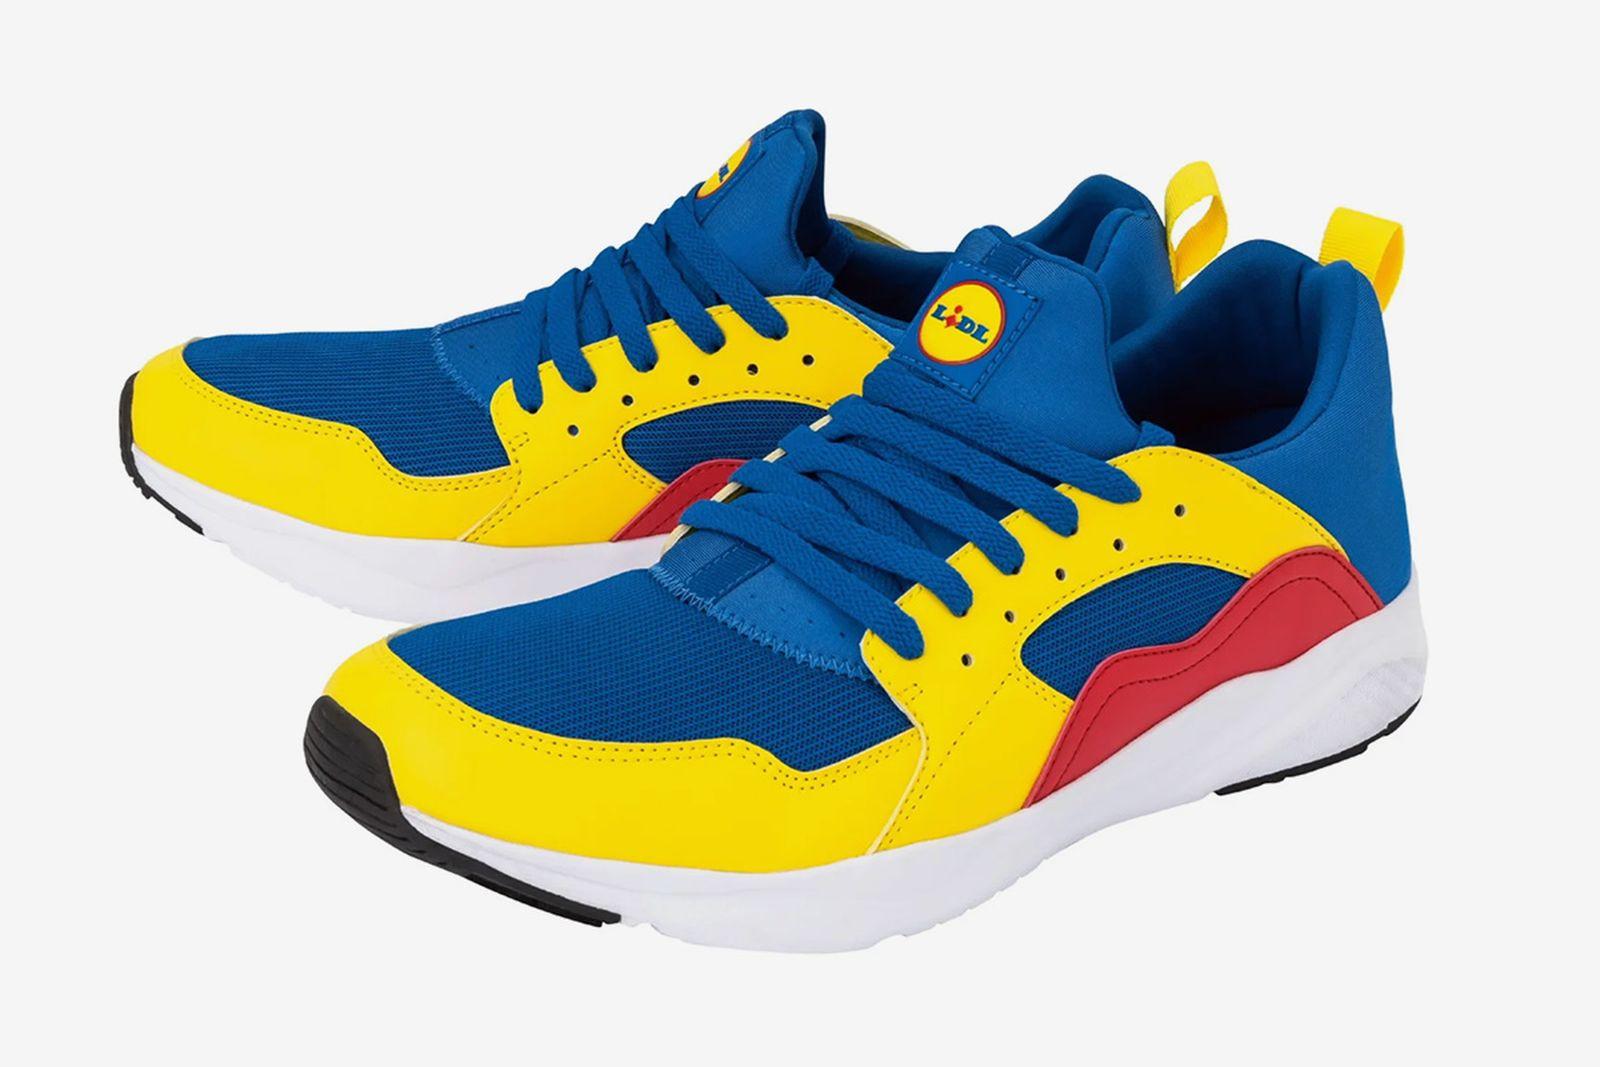 lidl-sneakers-main